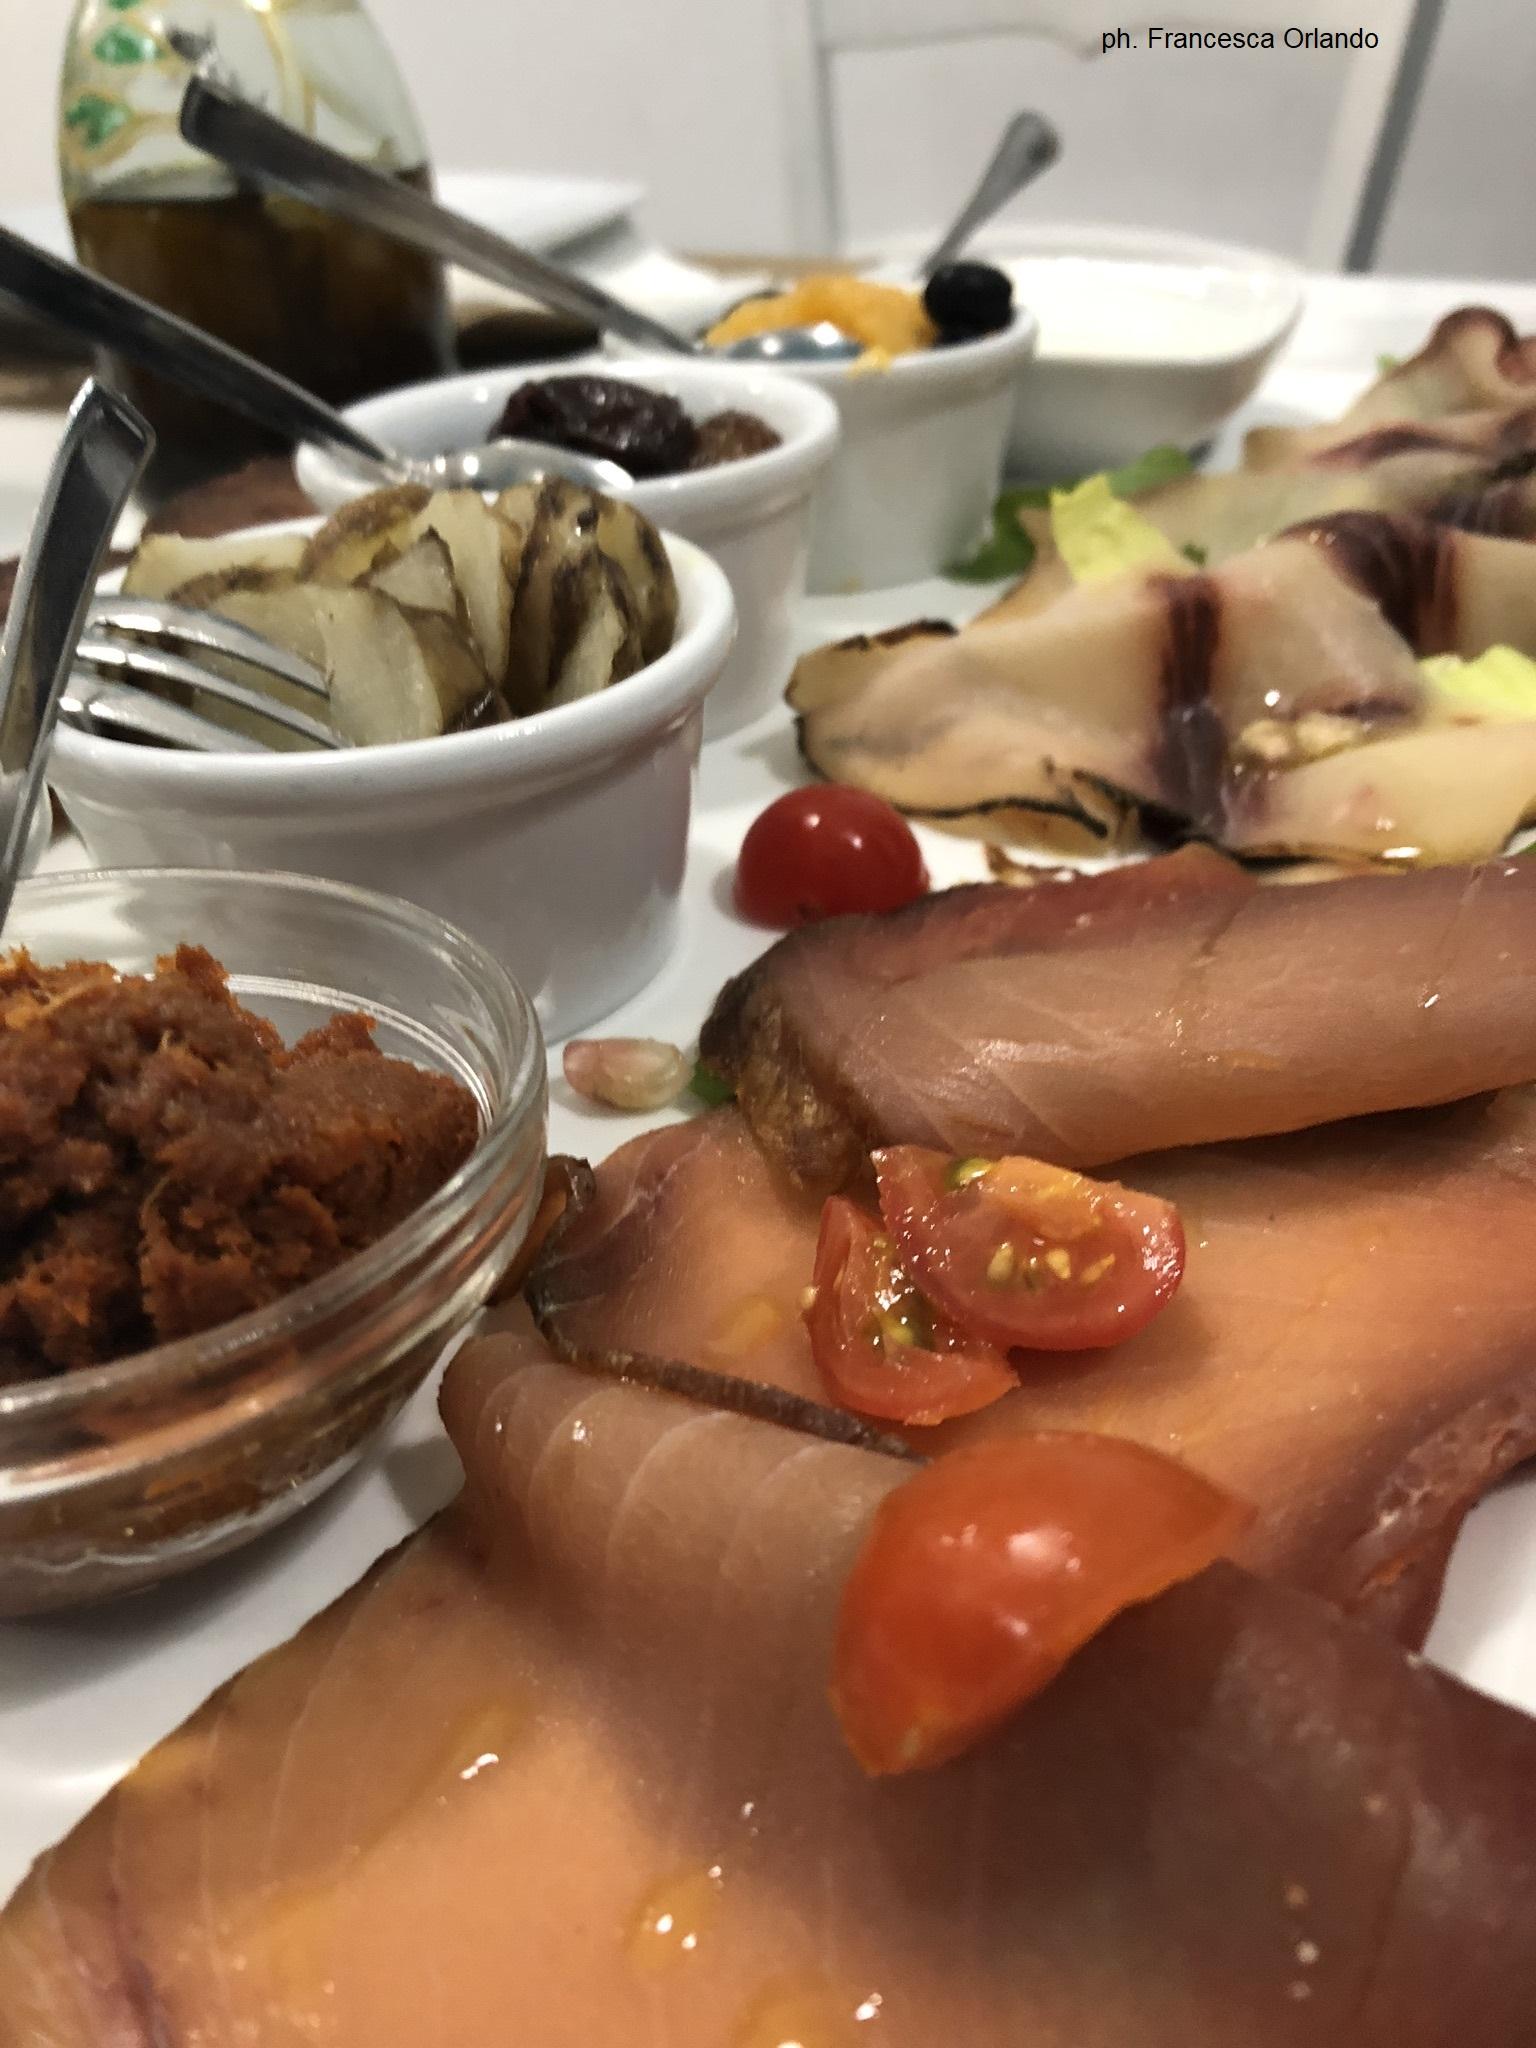 Offishina ristorante salumi di pesce